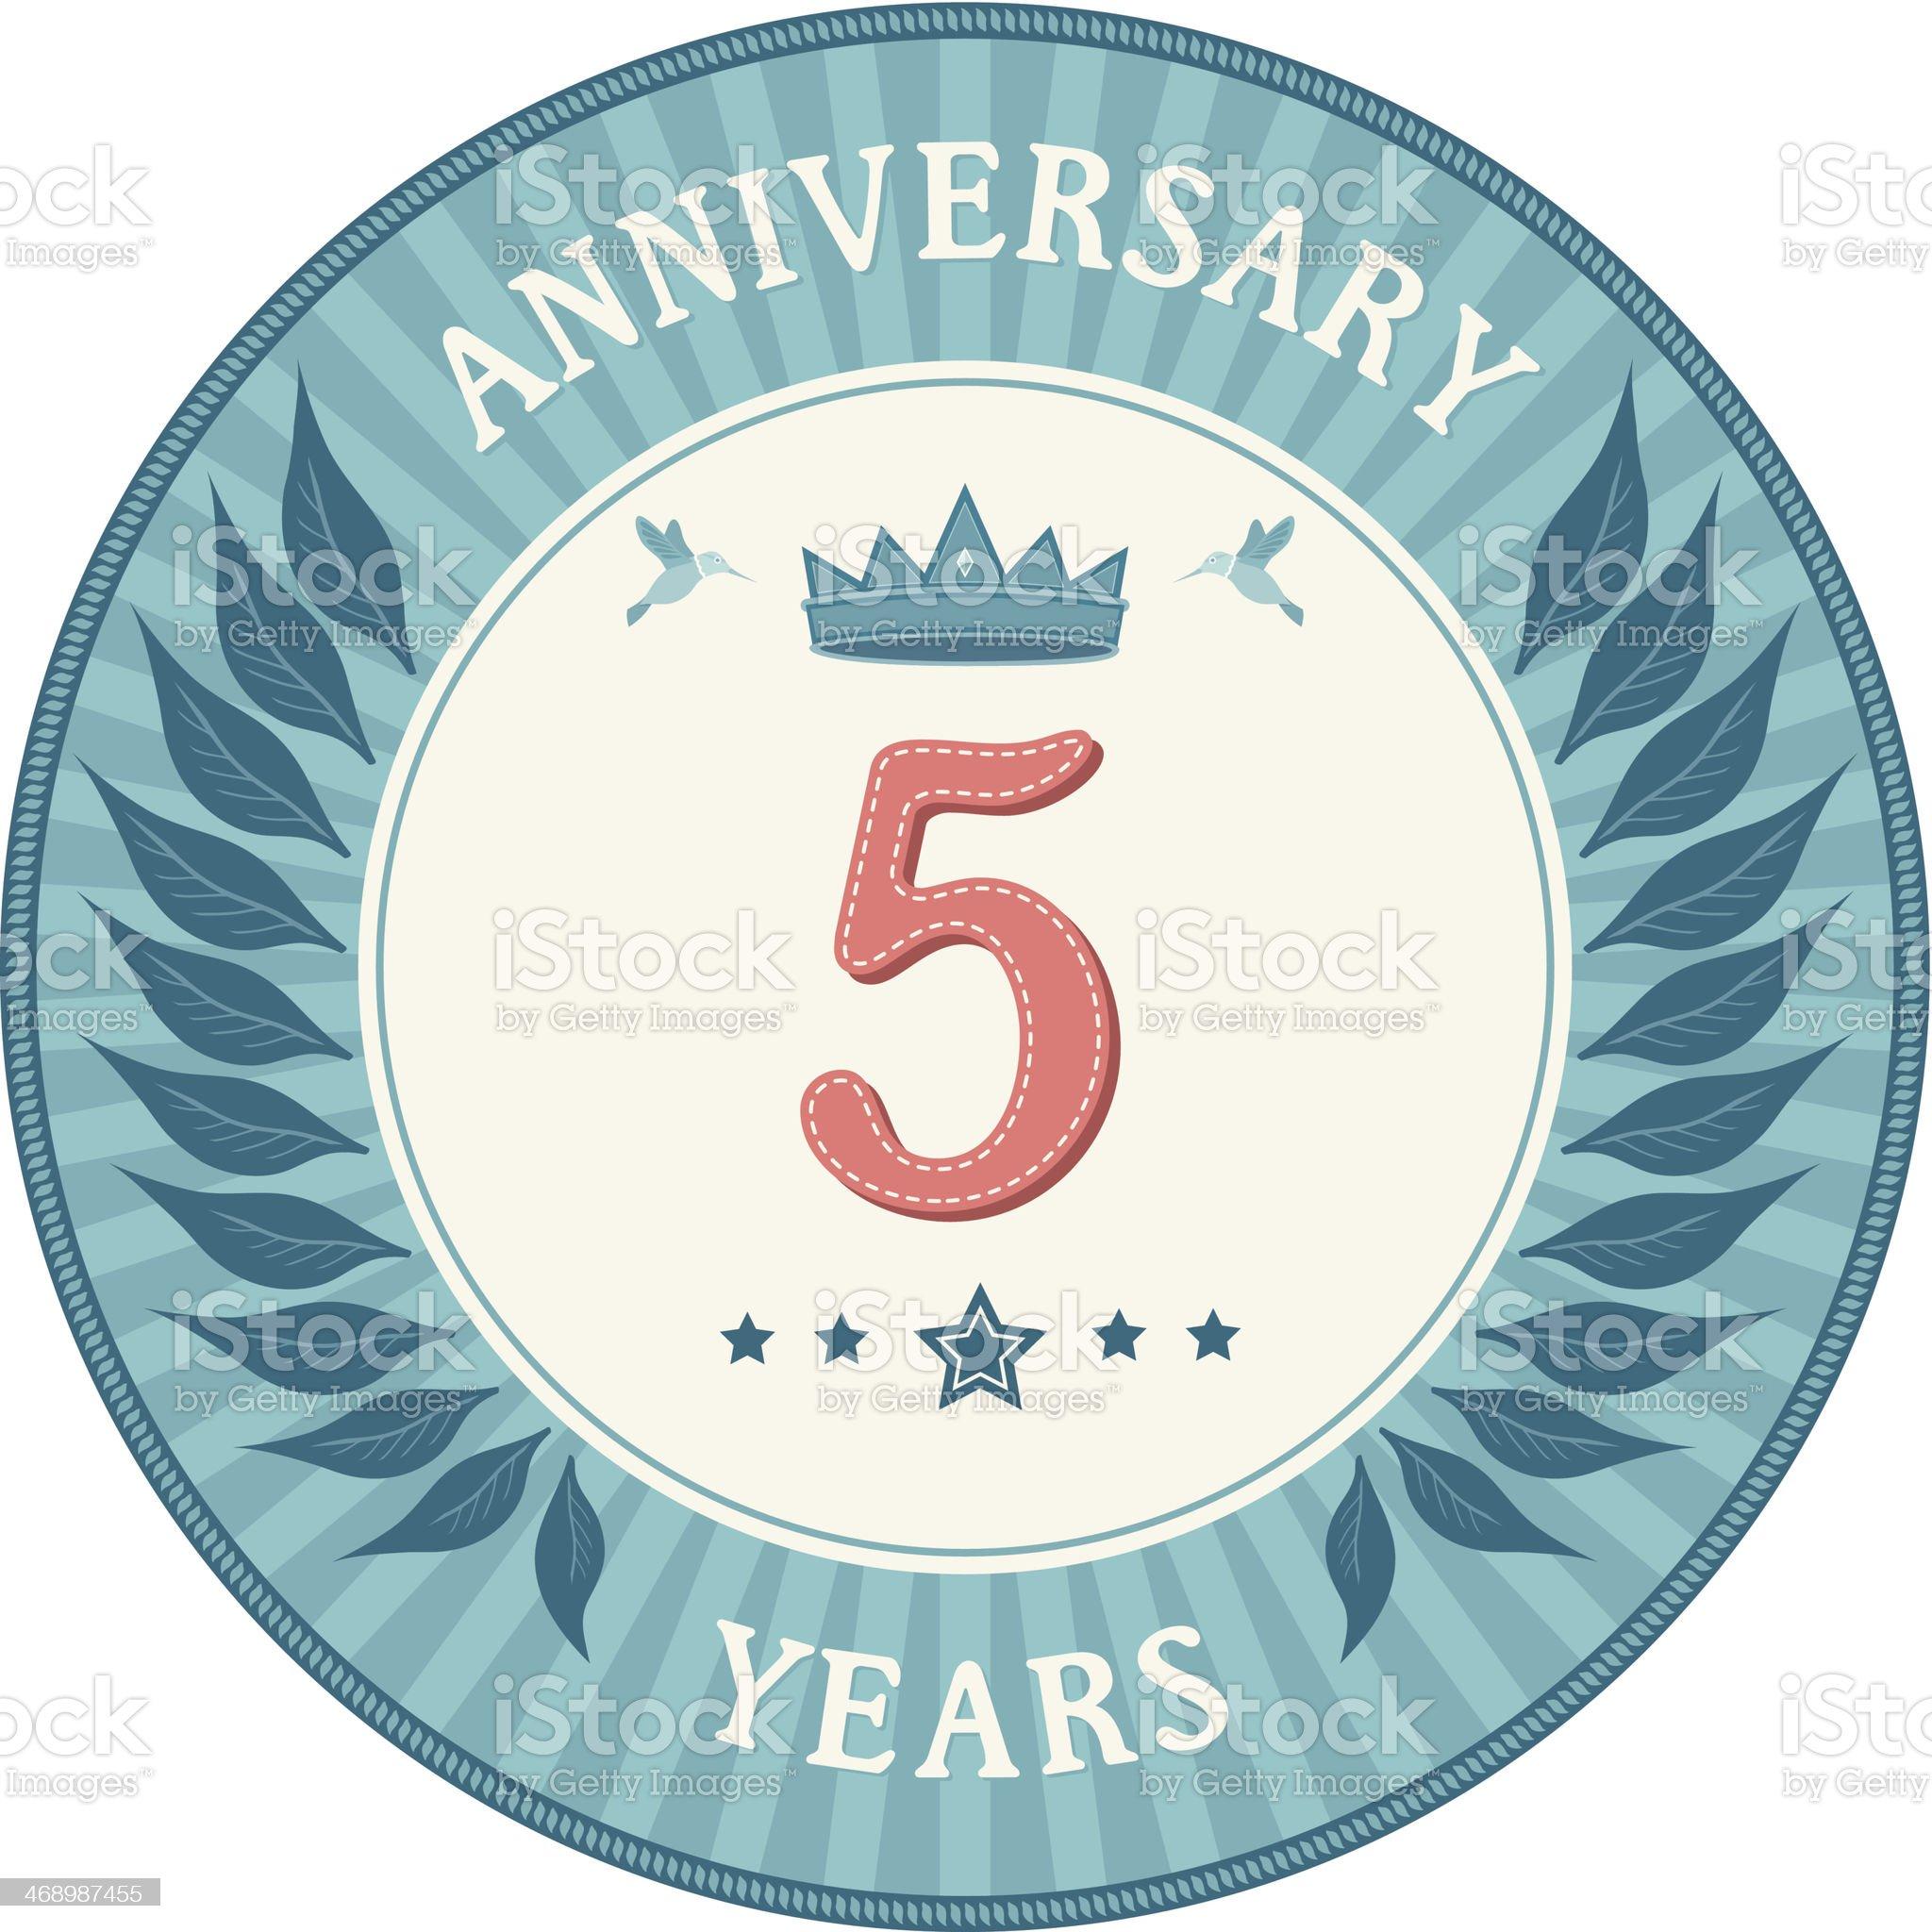 Five Years Anniversary Badge royalty-free stock vector art